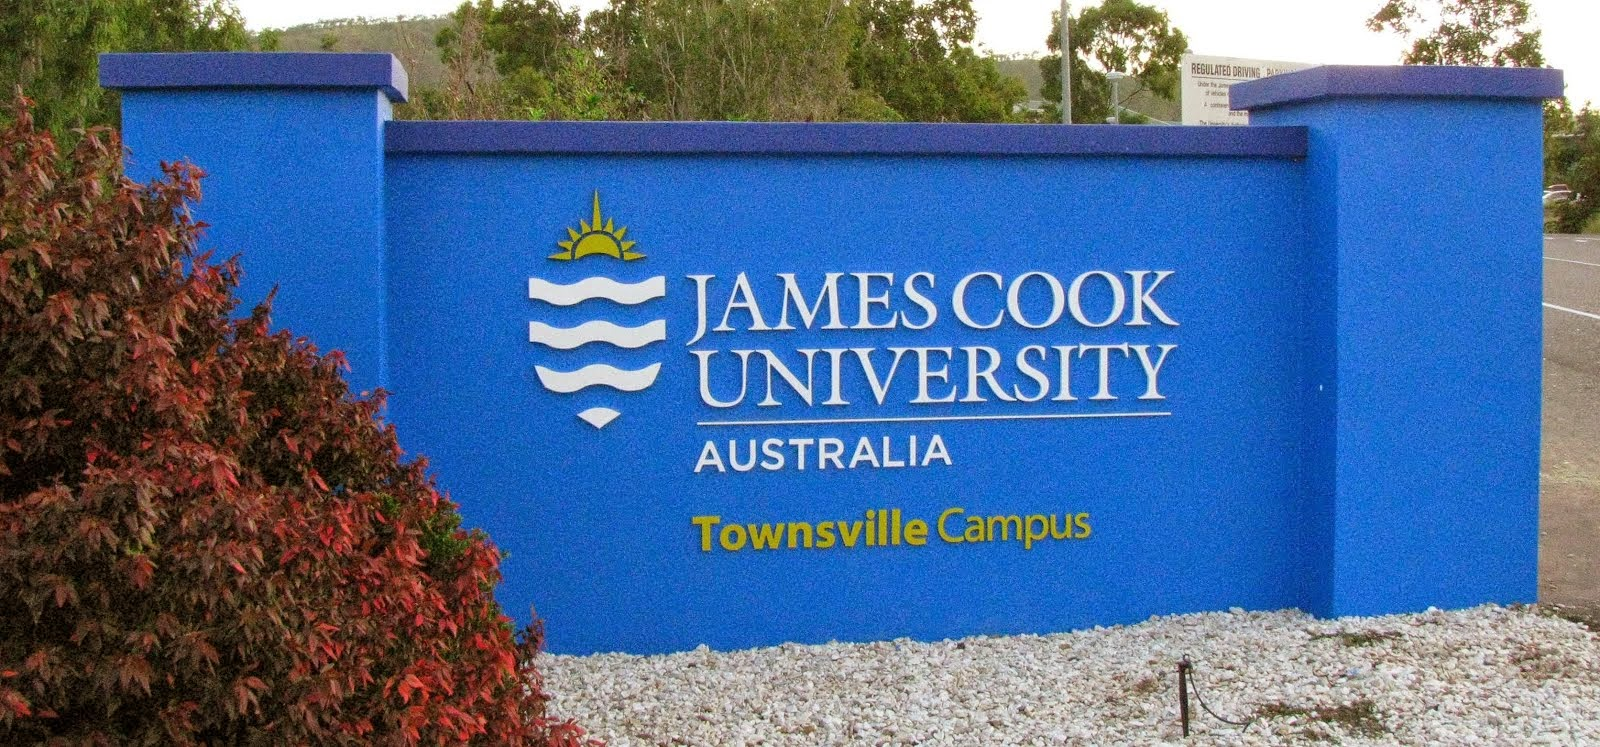 James Cook University banner